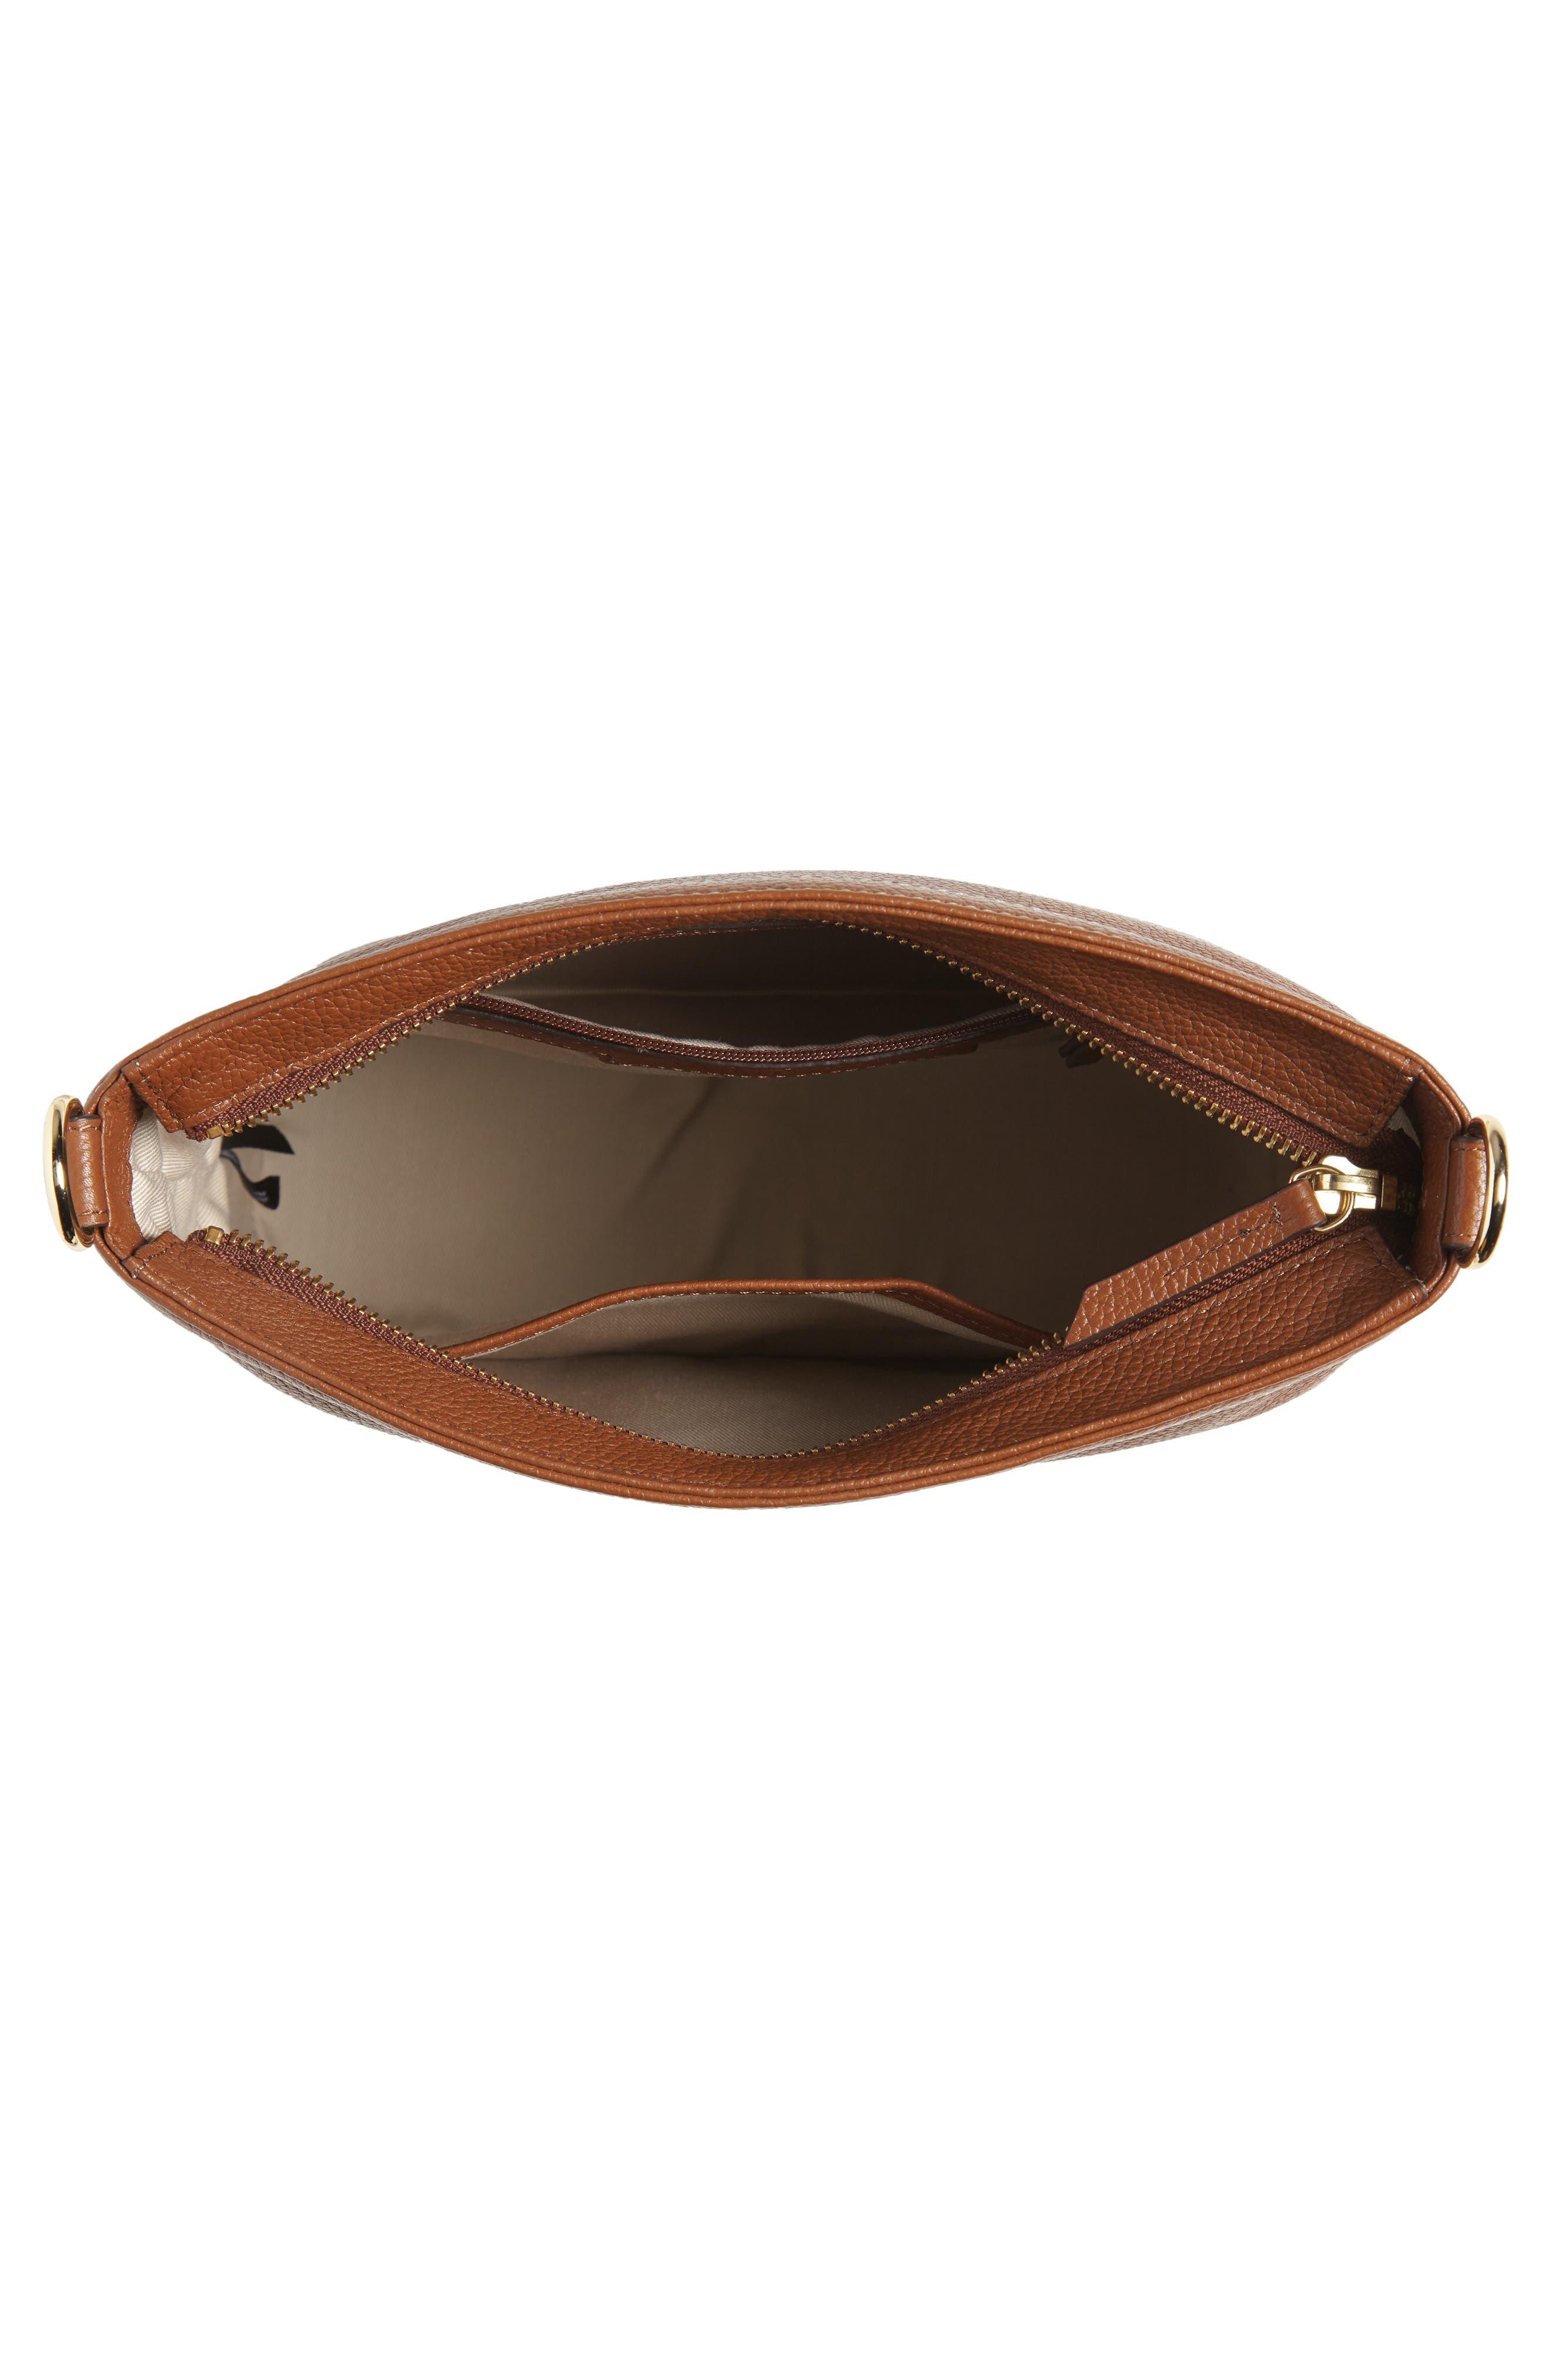 NORDSTROM,                             Maribel Leather Crossbody Bag,                             Alternate thumbnail 4, color,                             BROWN AZTEC